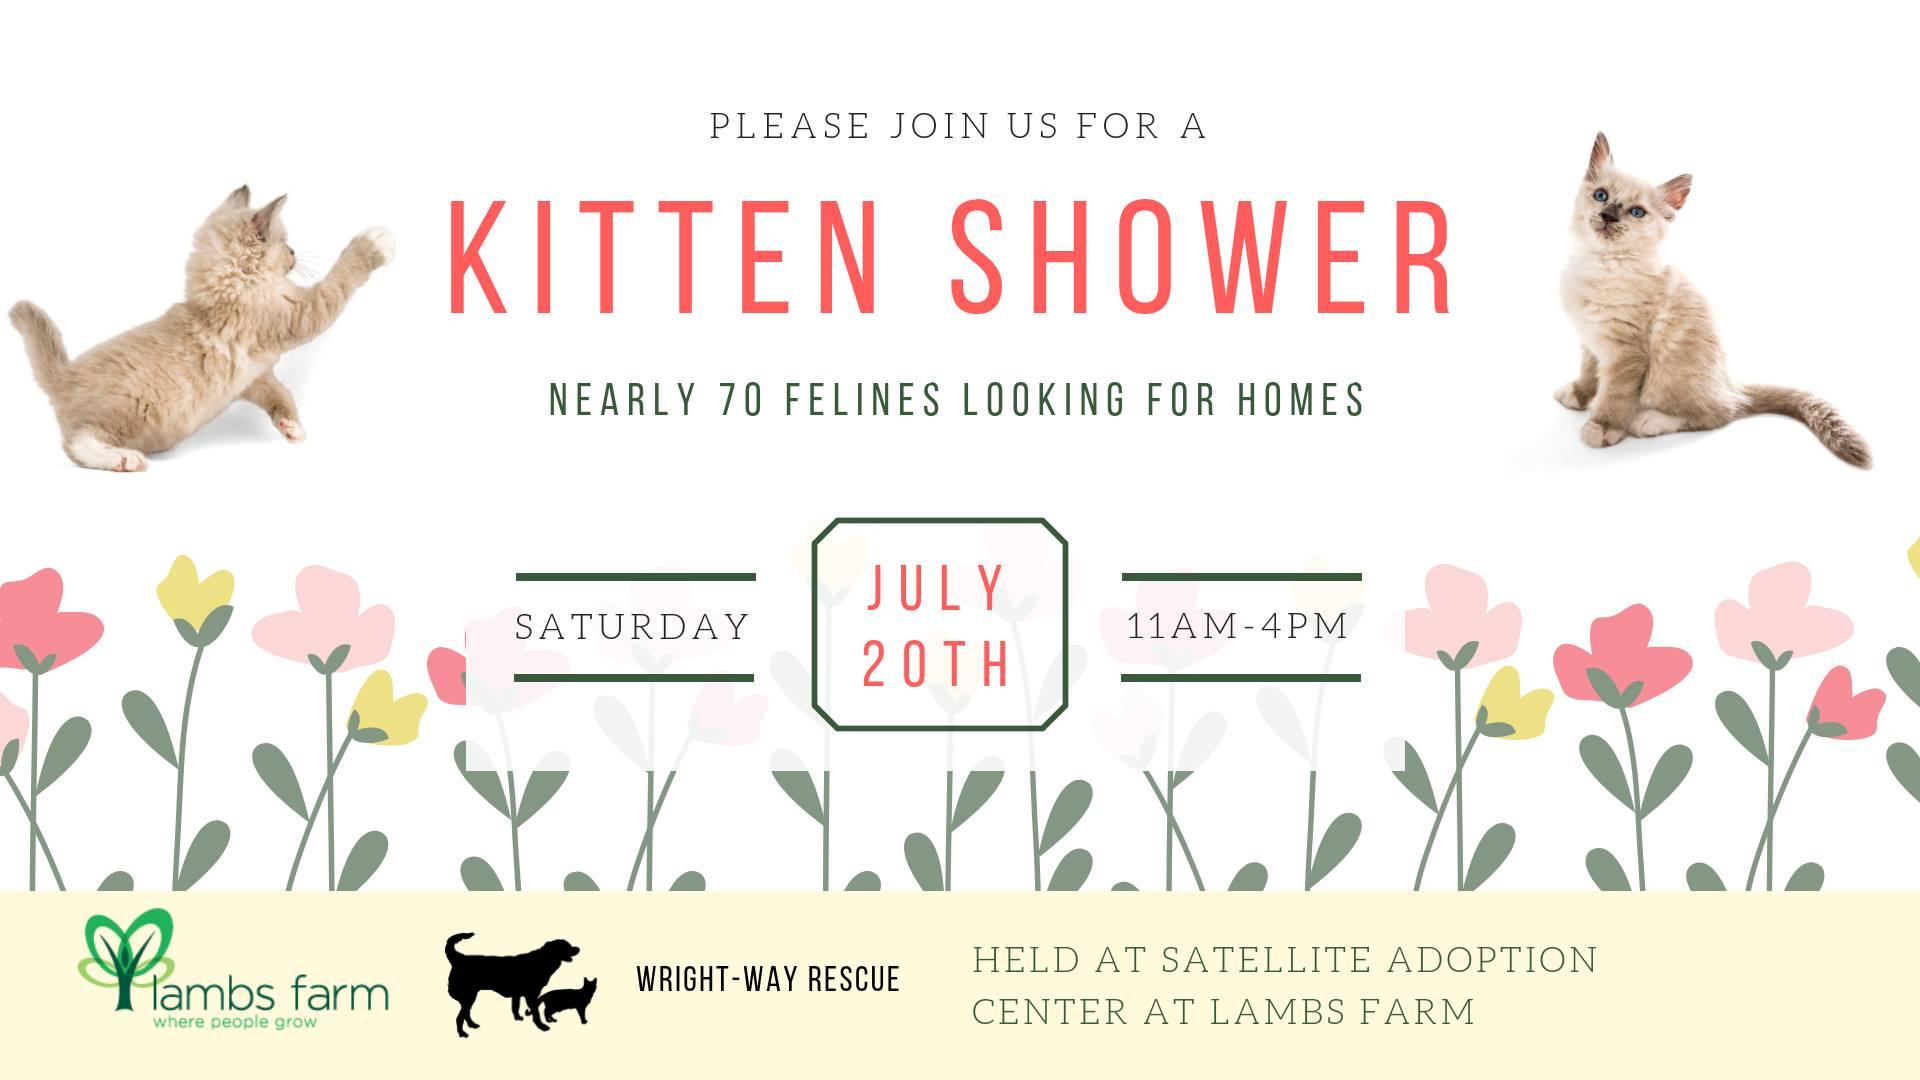 Lake County, Illinois, CVB - - Kitten Shower at Lambs Farm